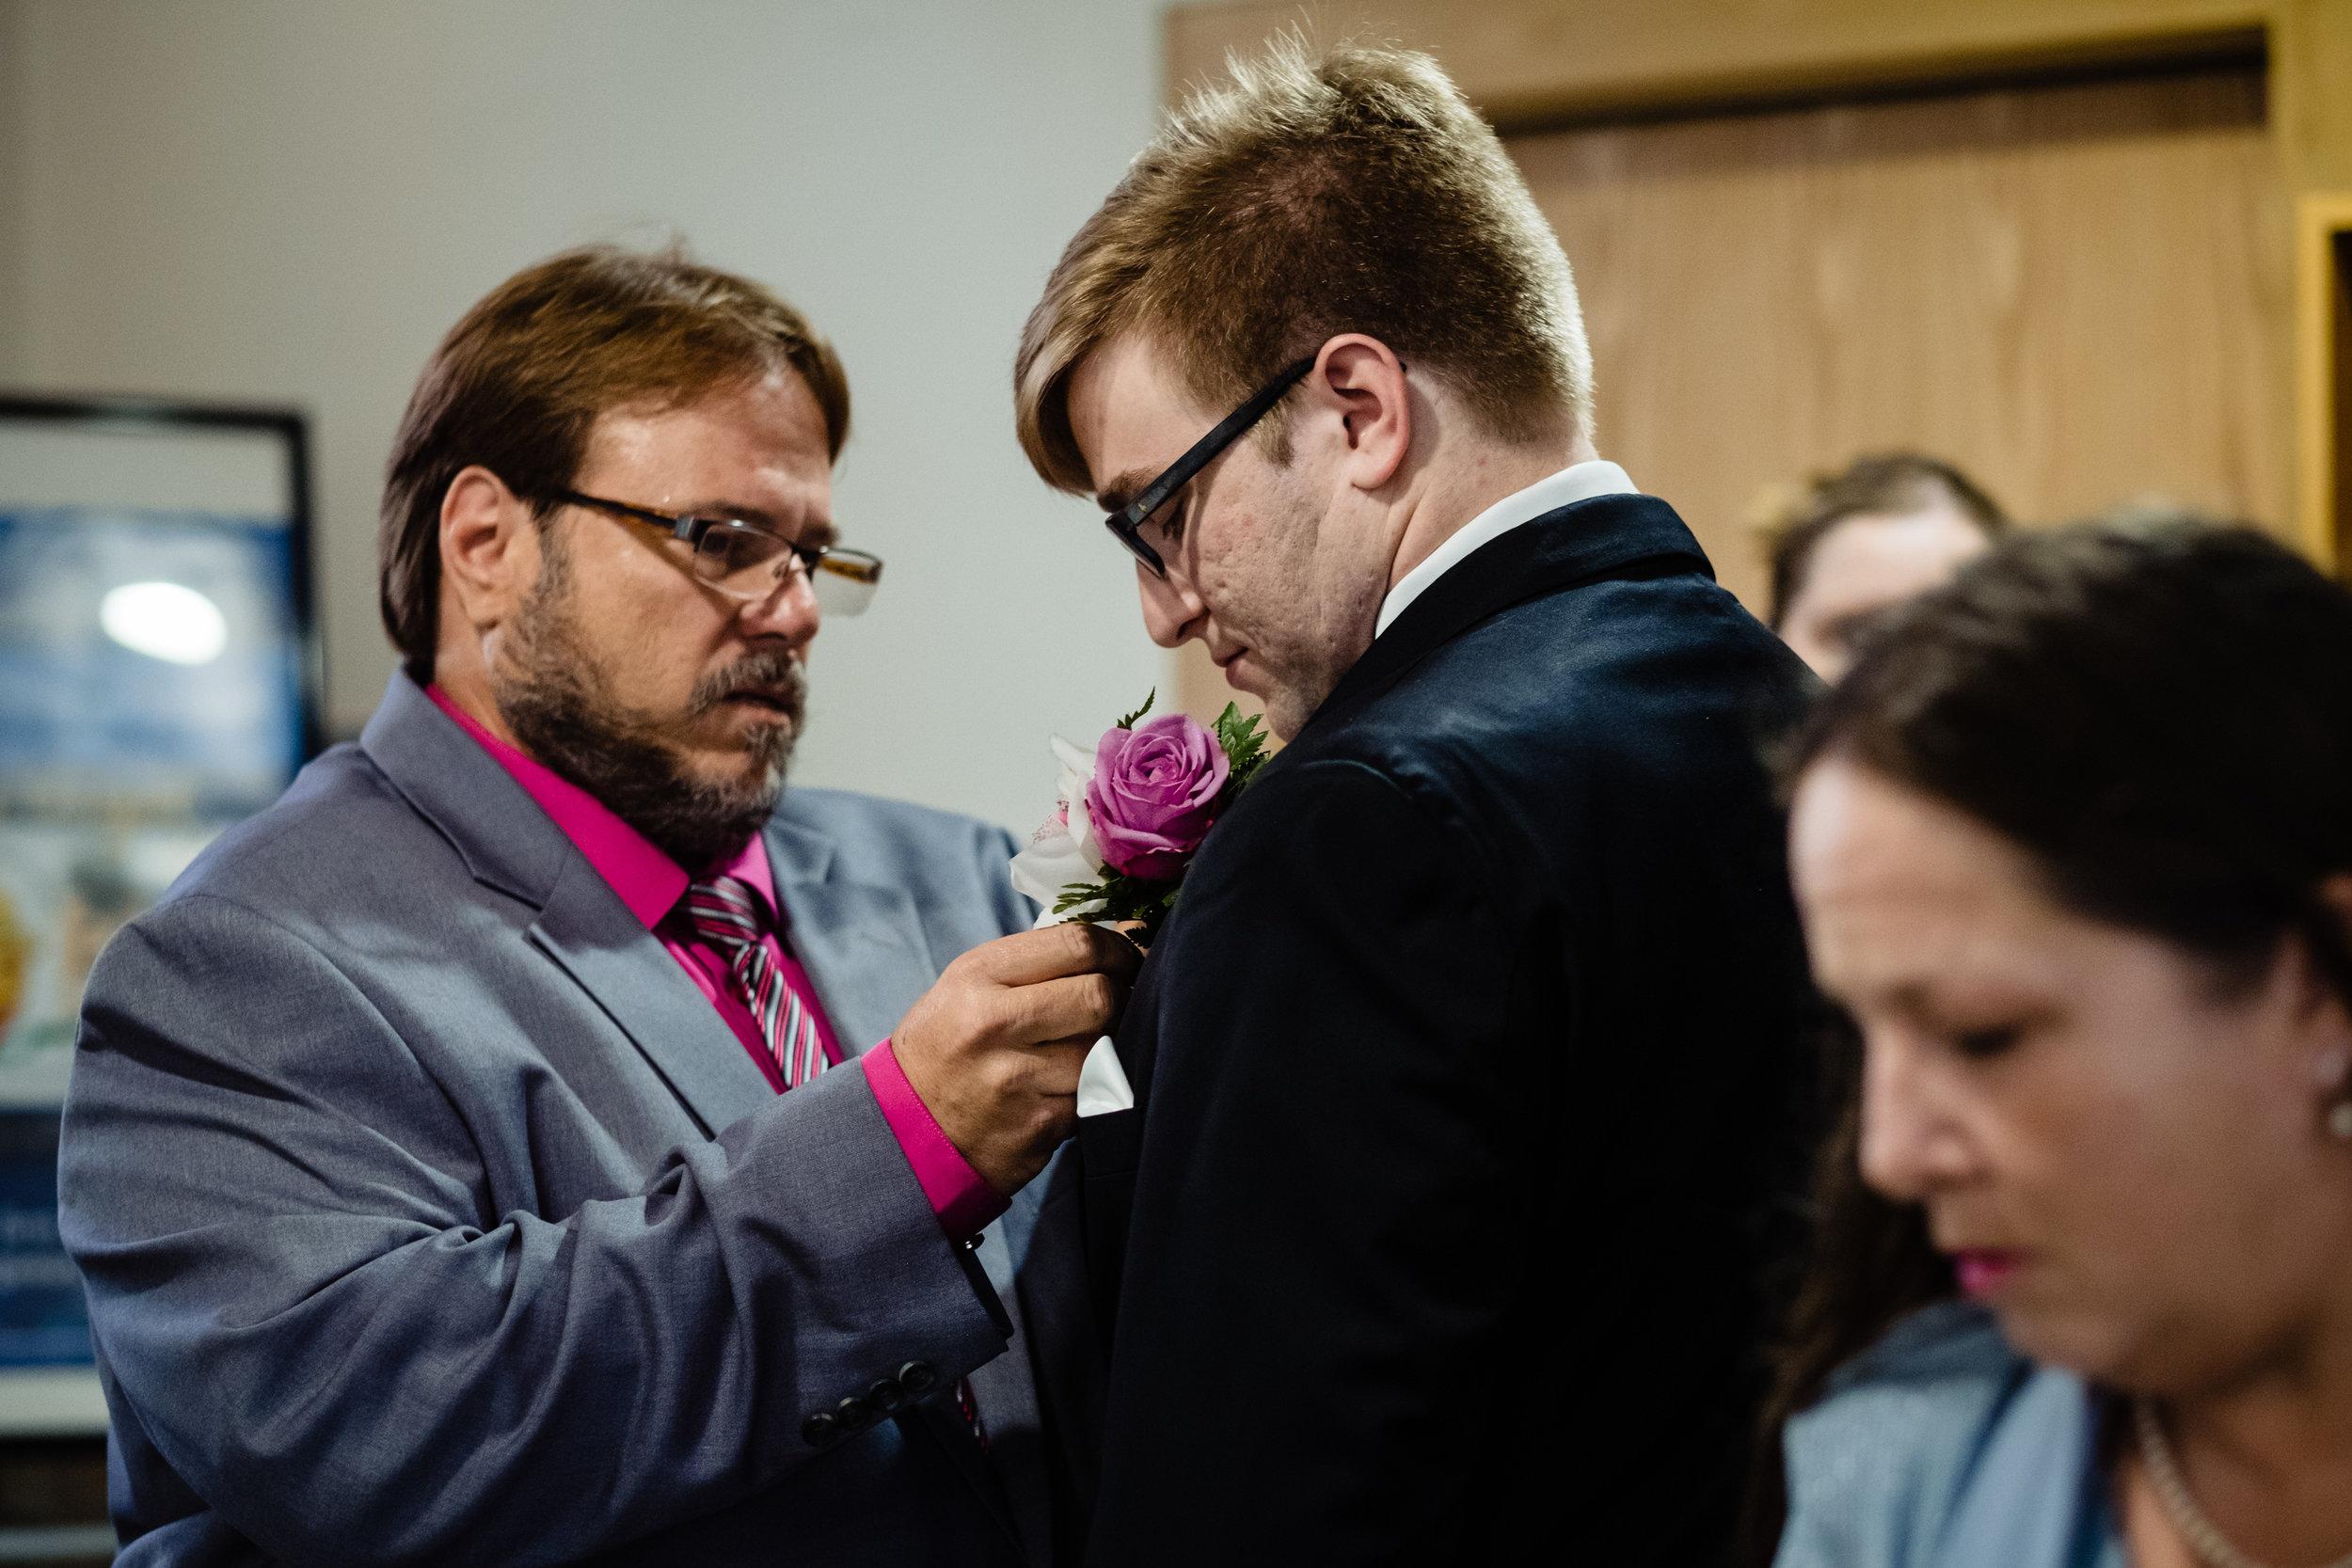 HAH_Zoe and Daniel_Clearwater Wedding_18_2018.jpg